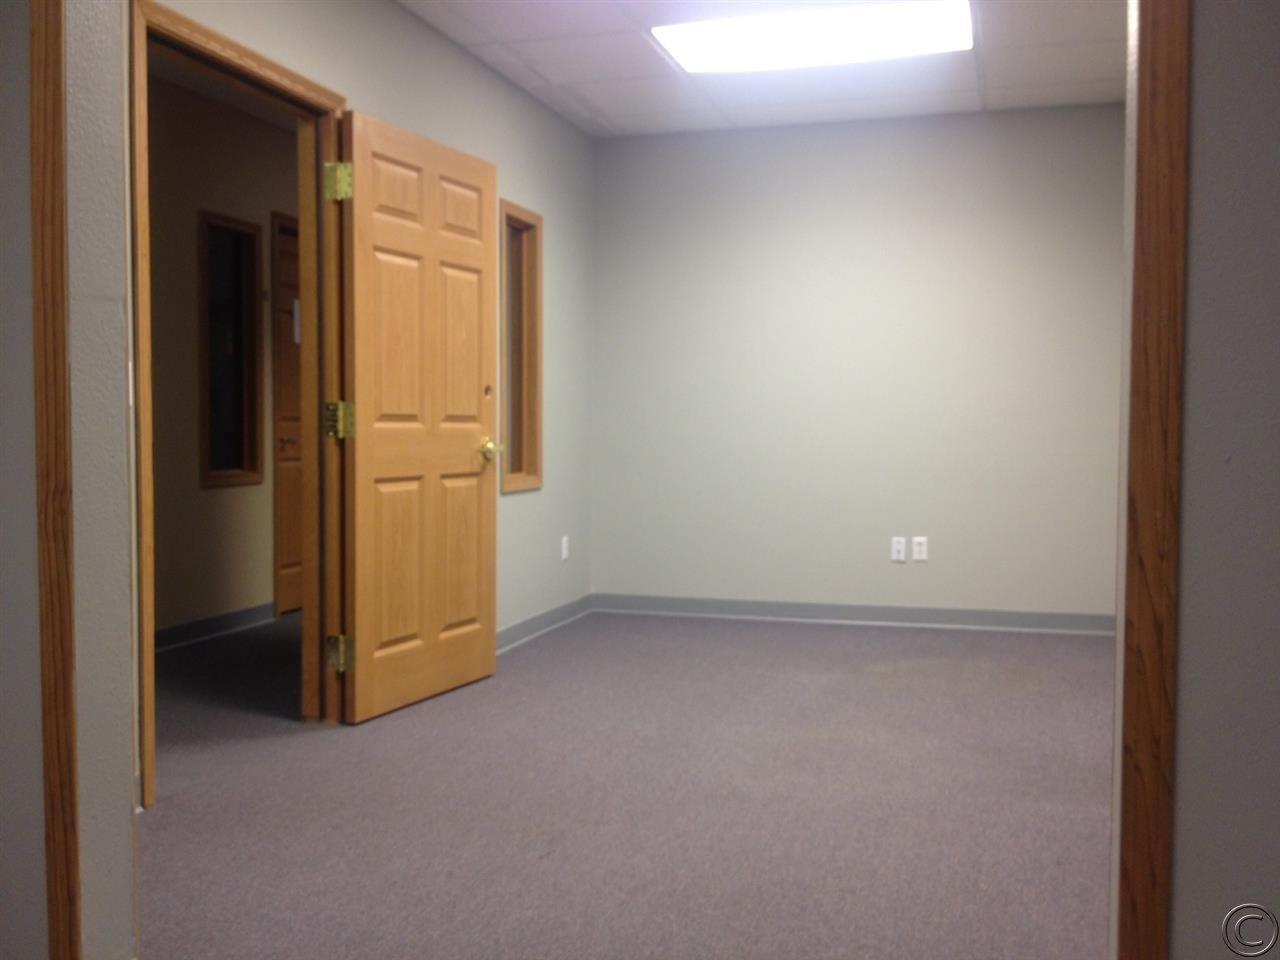 Rental Homes for Rent, ListingId:33128465, location: 2409 Dearborn Suite J Missoula 59801